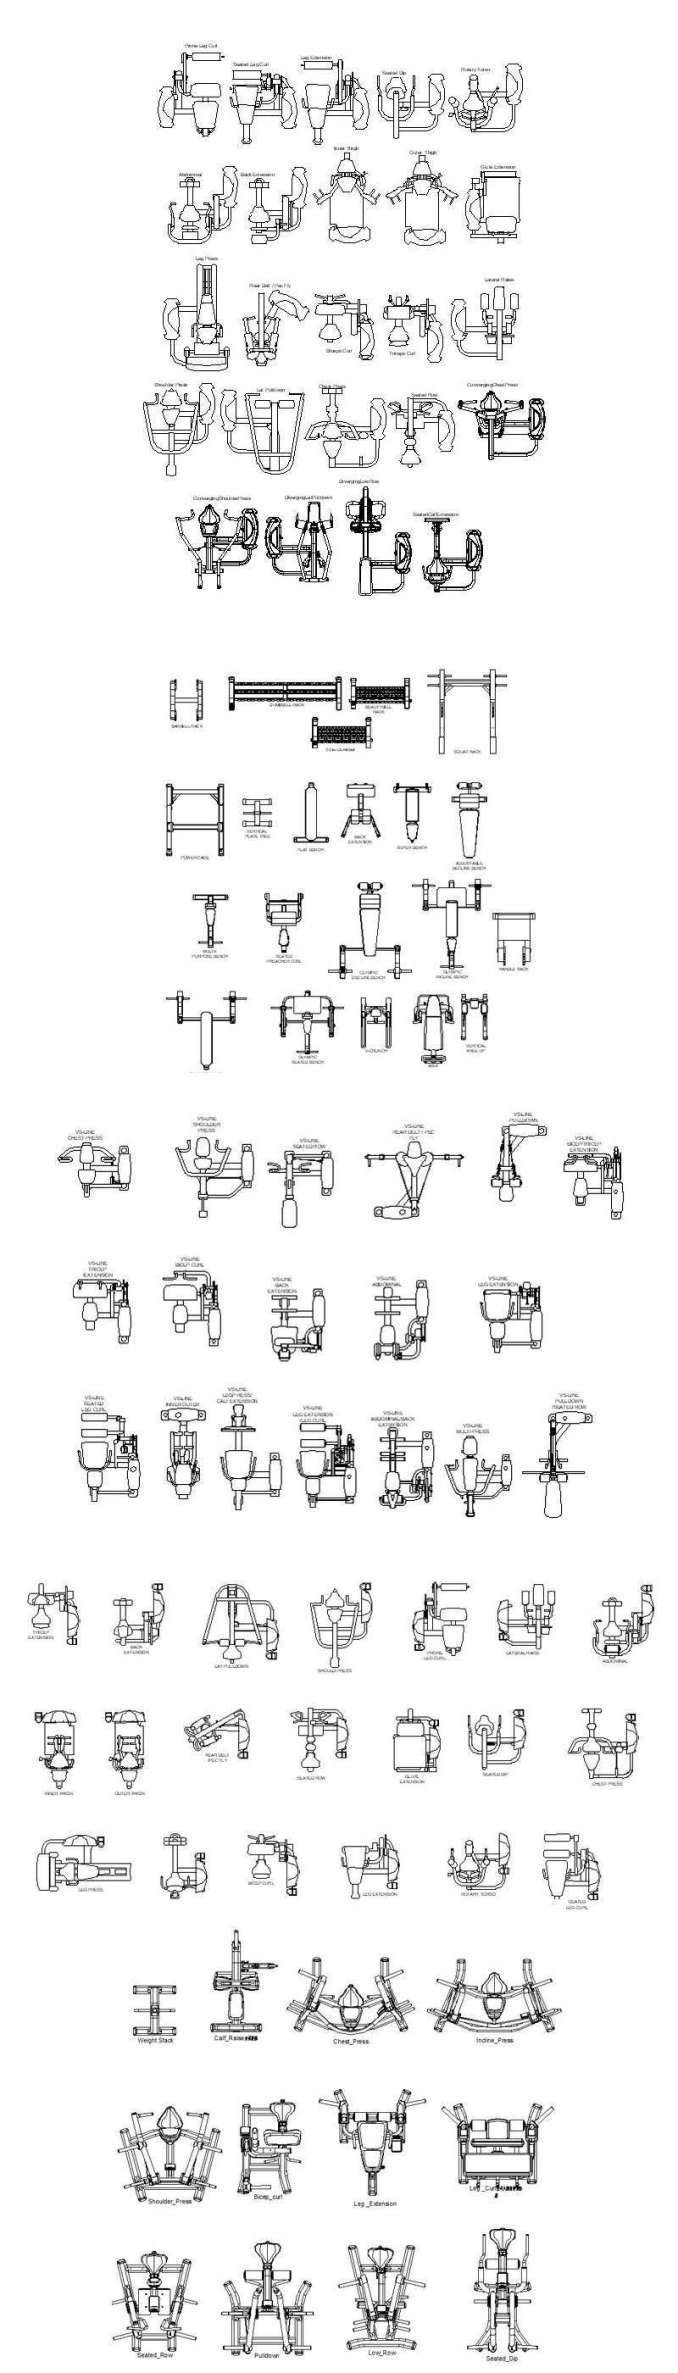 ★【All Gym,Fitness equipment CAD Blocks Bundle-Stadium,Gymnasium,  playground, sports hall V 2】@Gem CAD Blocks,Autocad Blocks,Drawings,CAD  Details